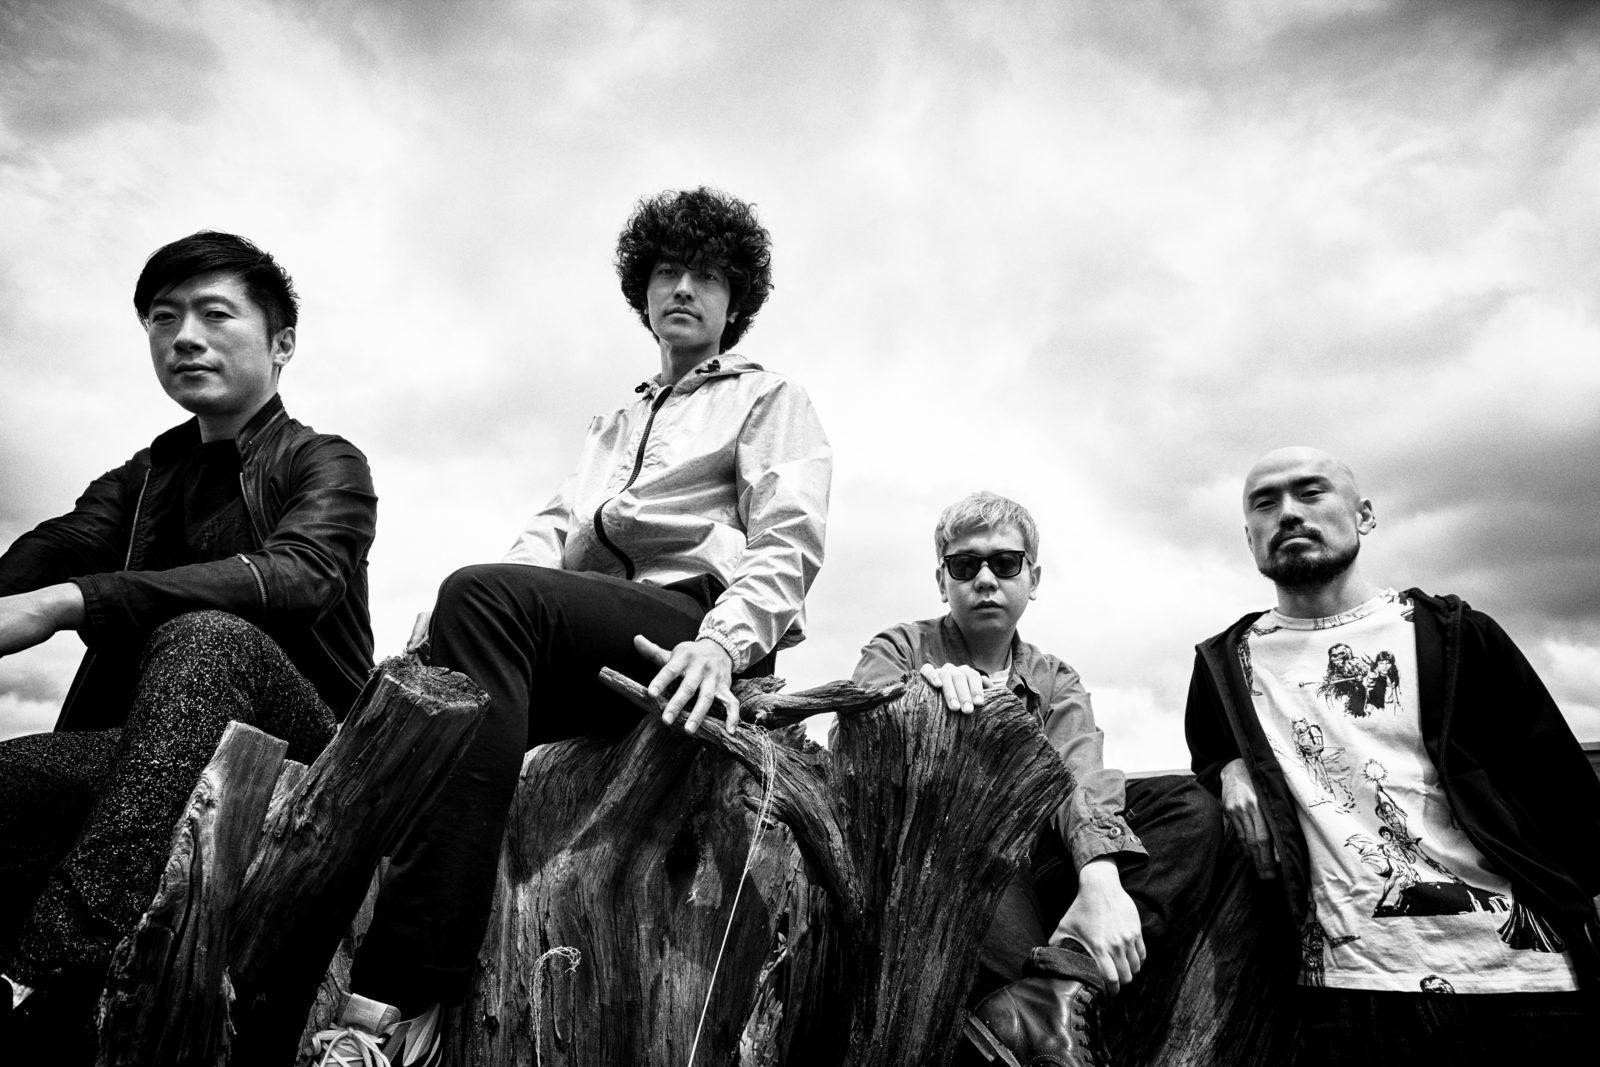 8otto、超強力なカムバック・アルバム『Dawn On』特設サイト オープンで後藤正文らコメントも。ツアーも決定サムネイル画像